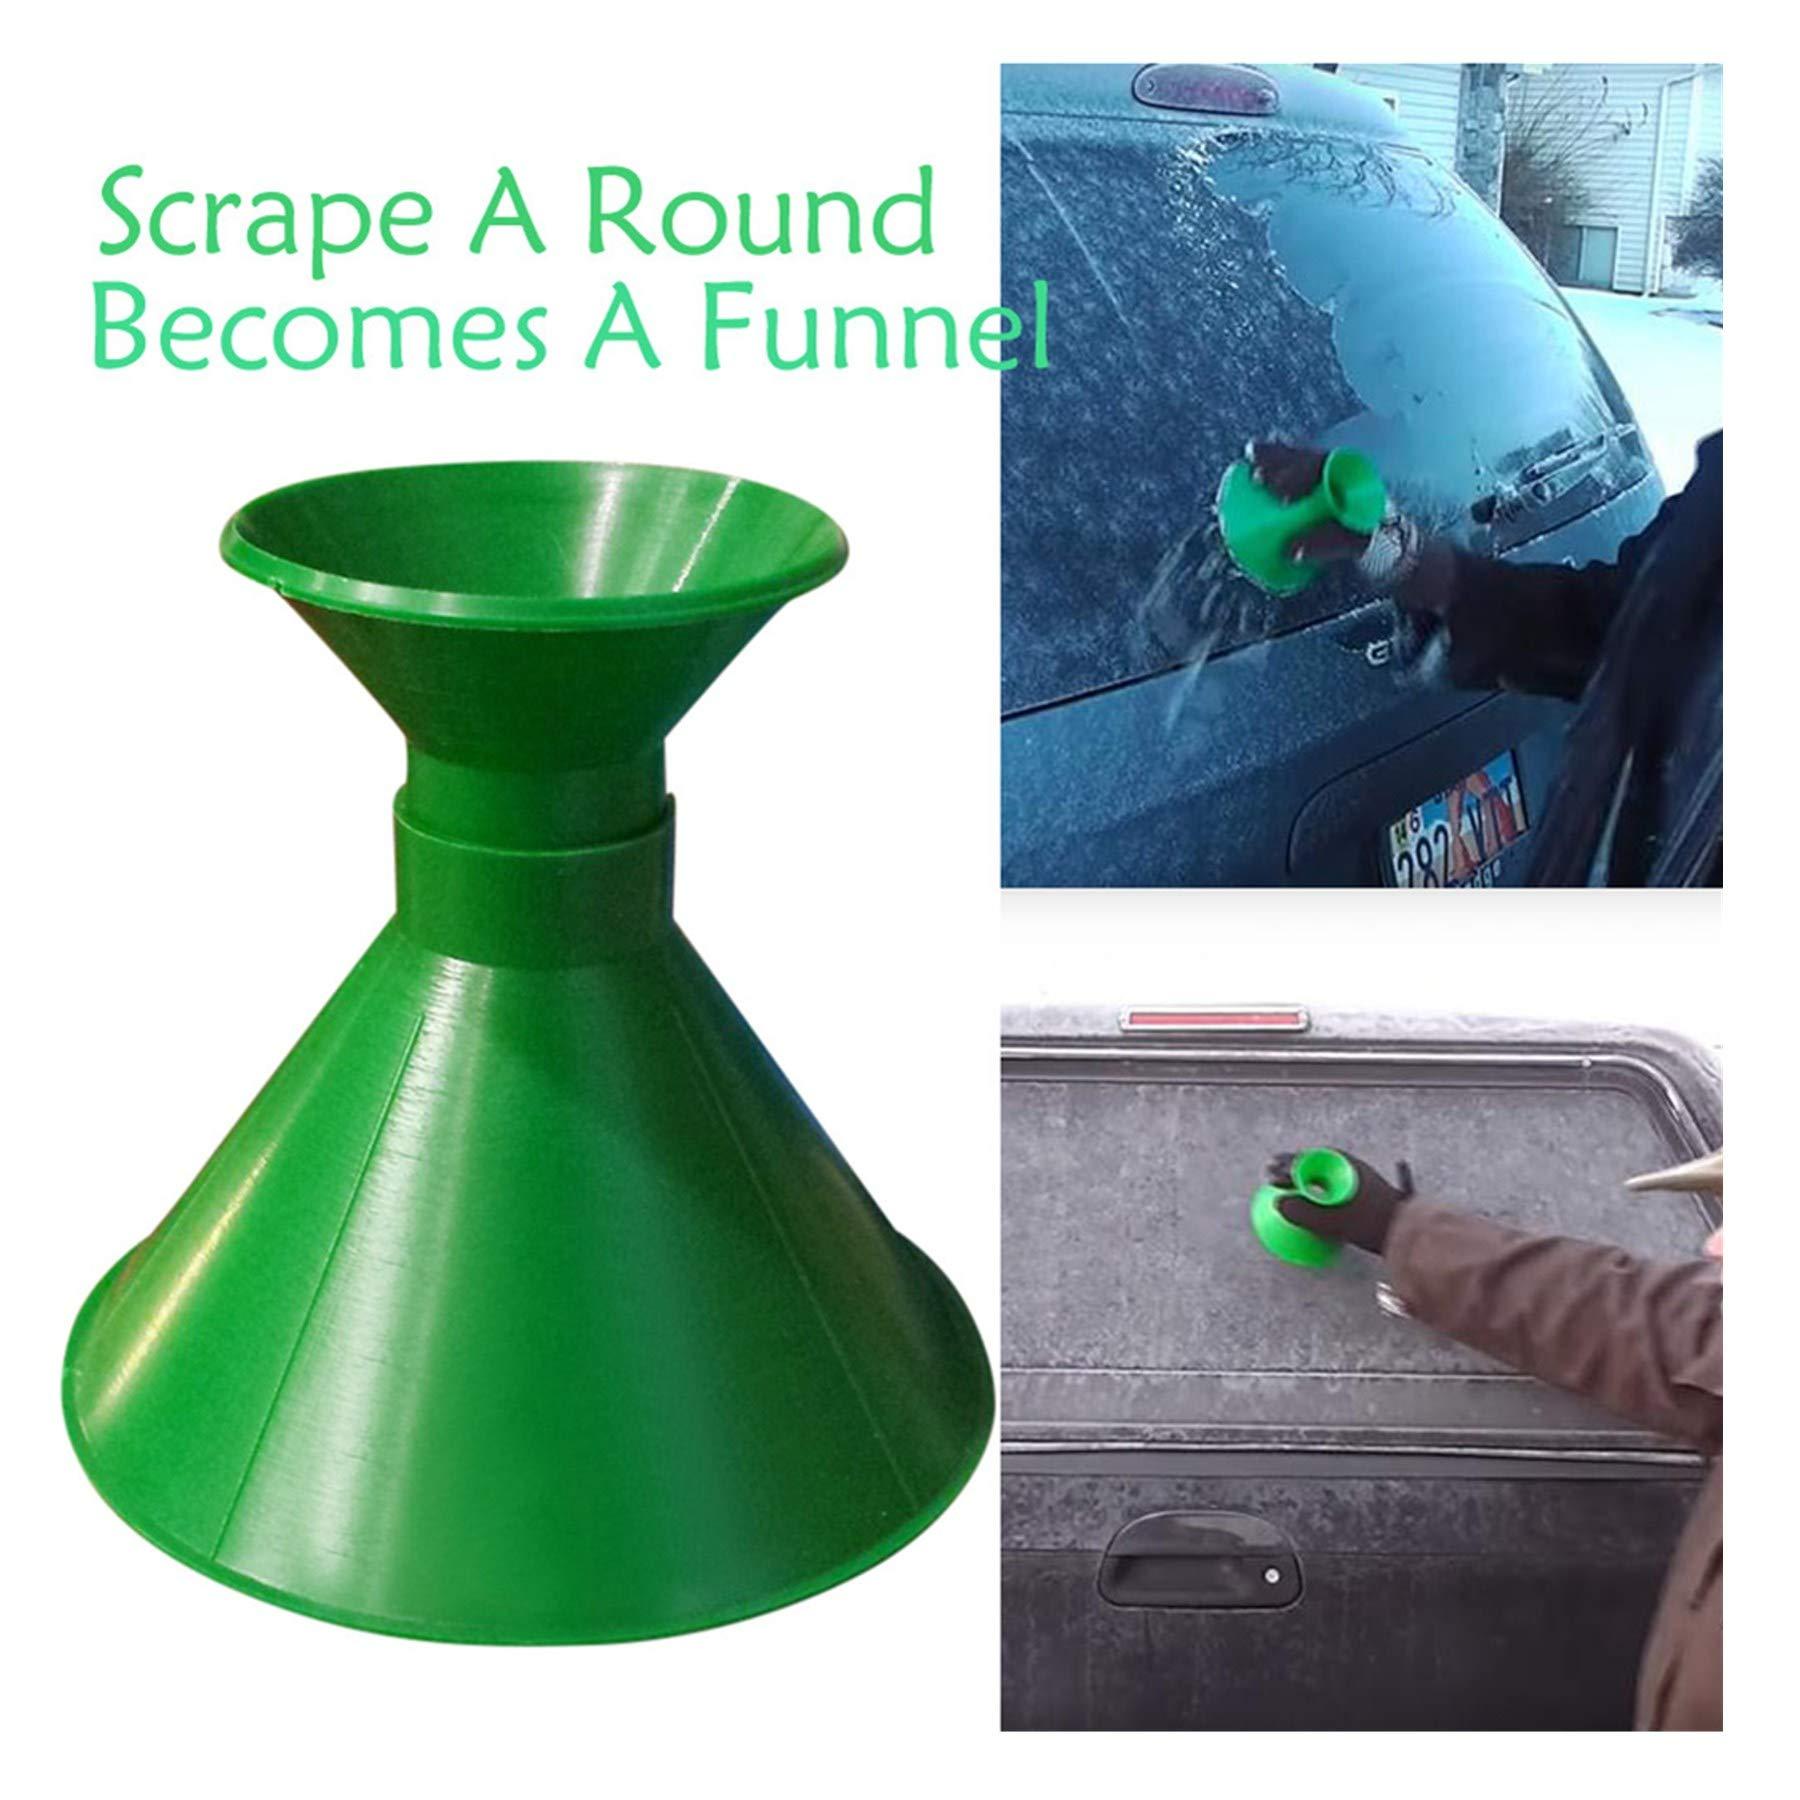 Challyhope Scrape A Round Ice Scraper Magic Scraper Cone Windshield Ice Scraper Snow Scraper Snow Removal Tools (Green)